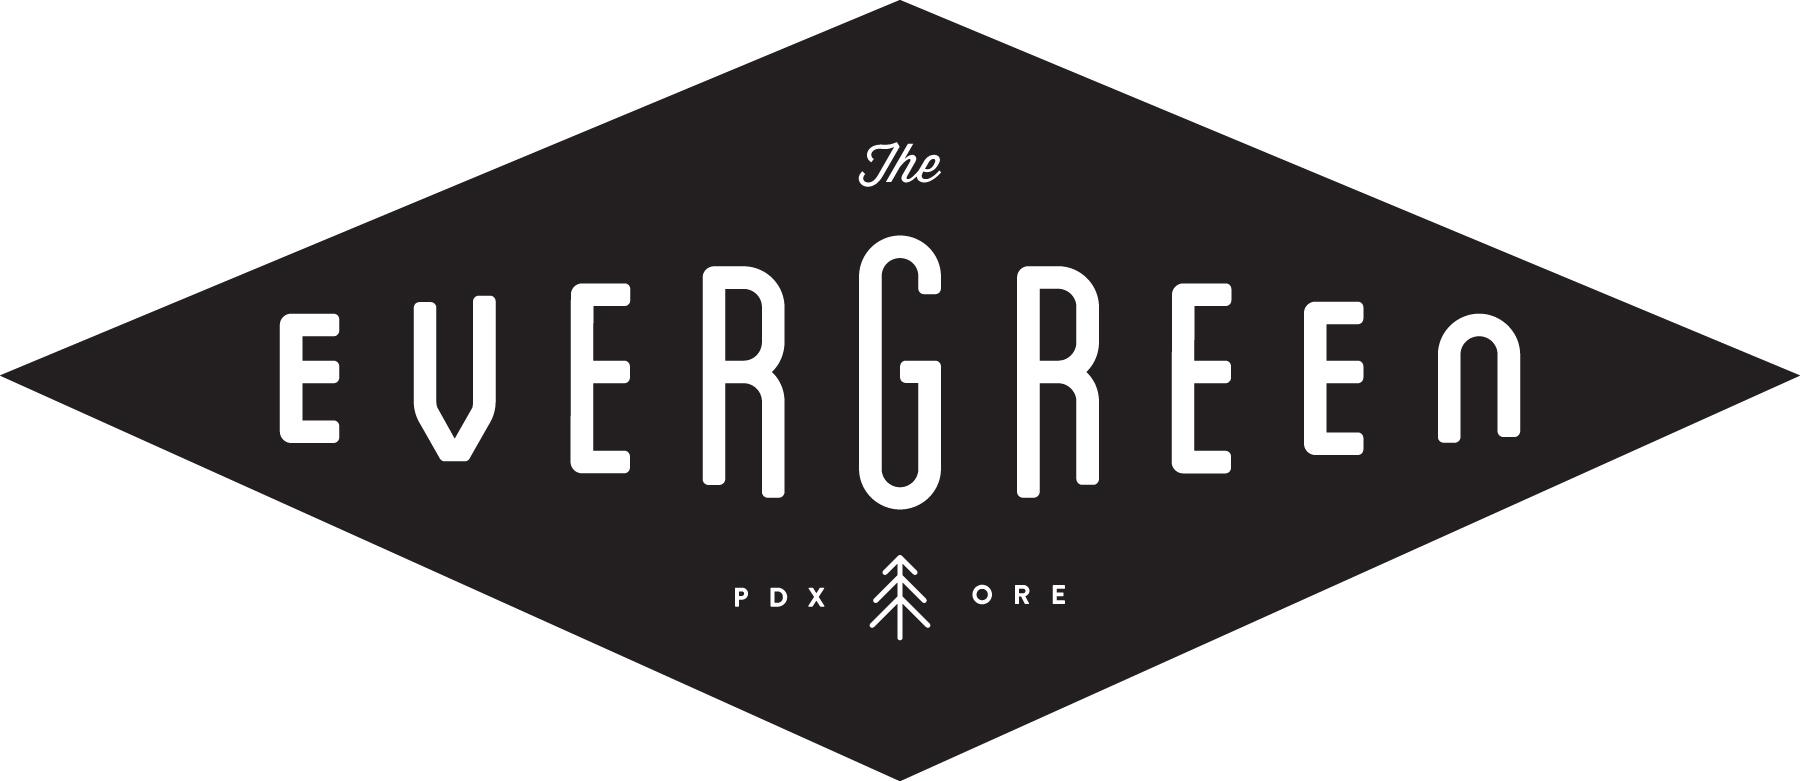 the-evergreen.jpg